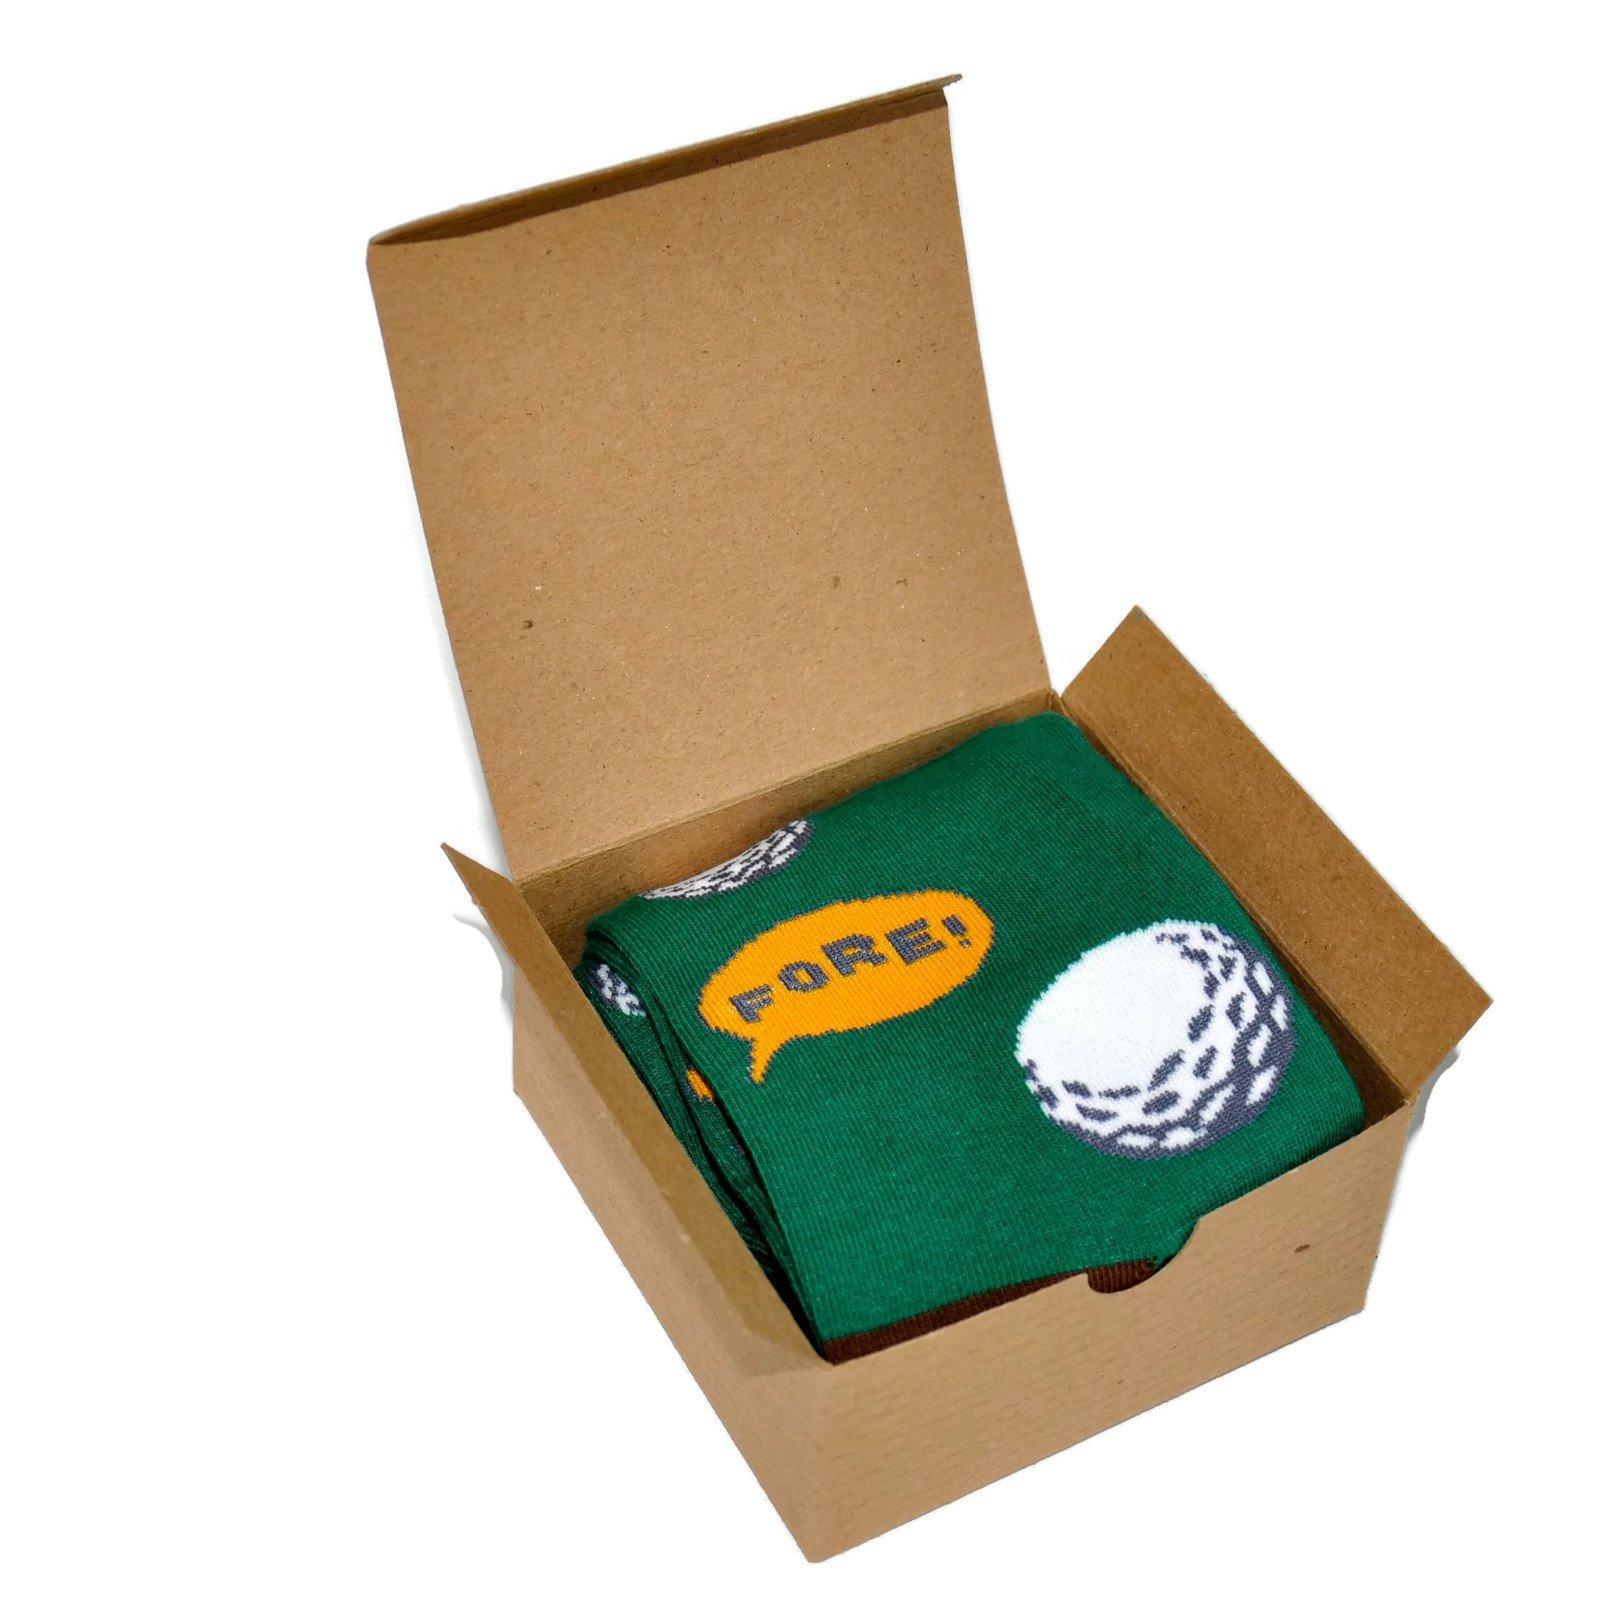 Themed Patterned Men's Novelty Socks 1 Pair in Small Gift Box (Golf - Green)